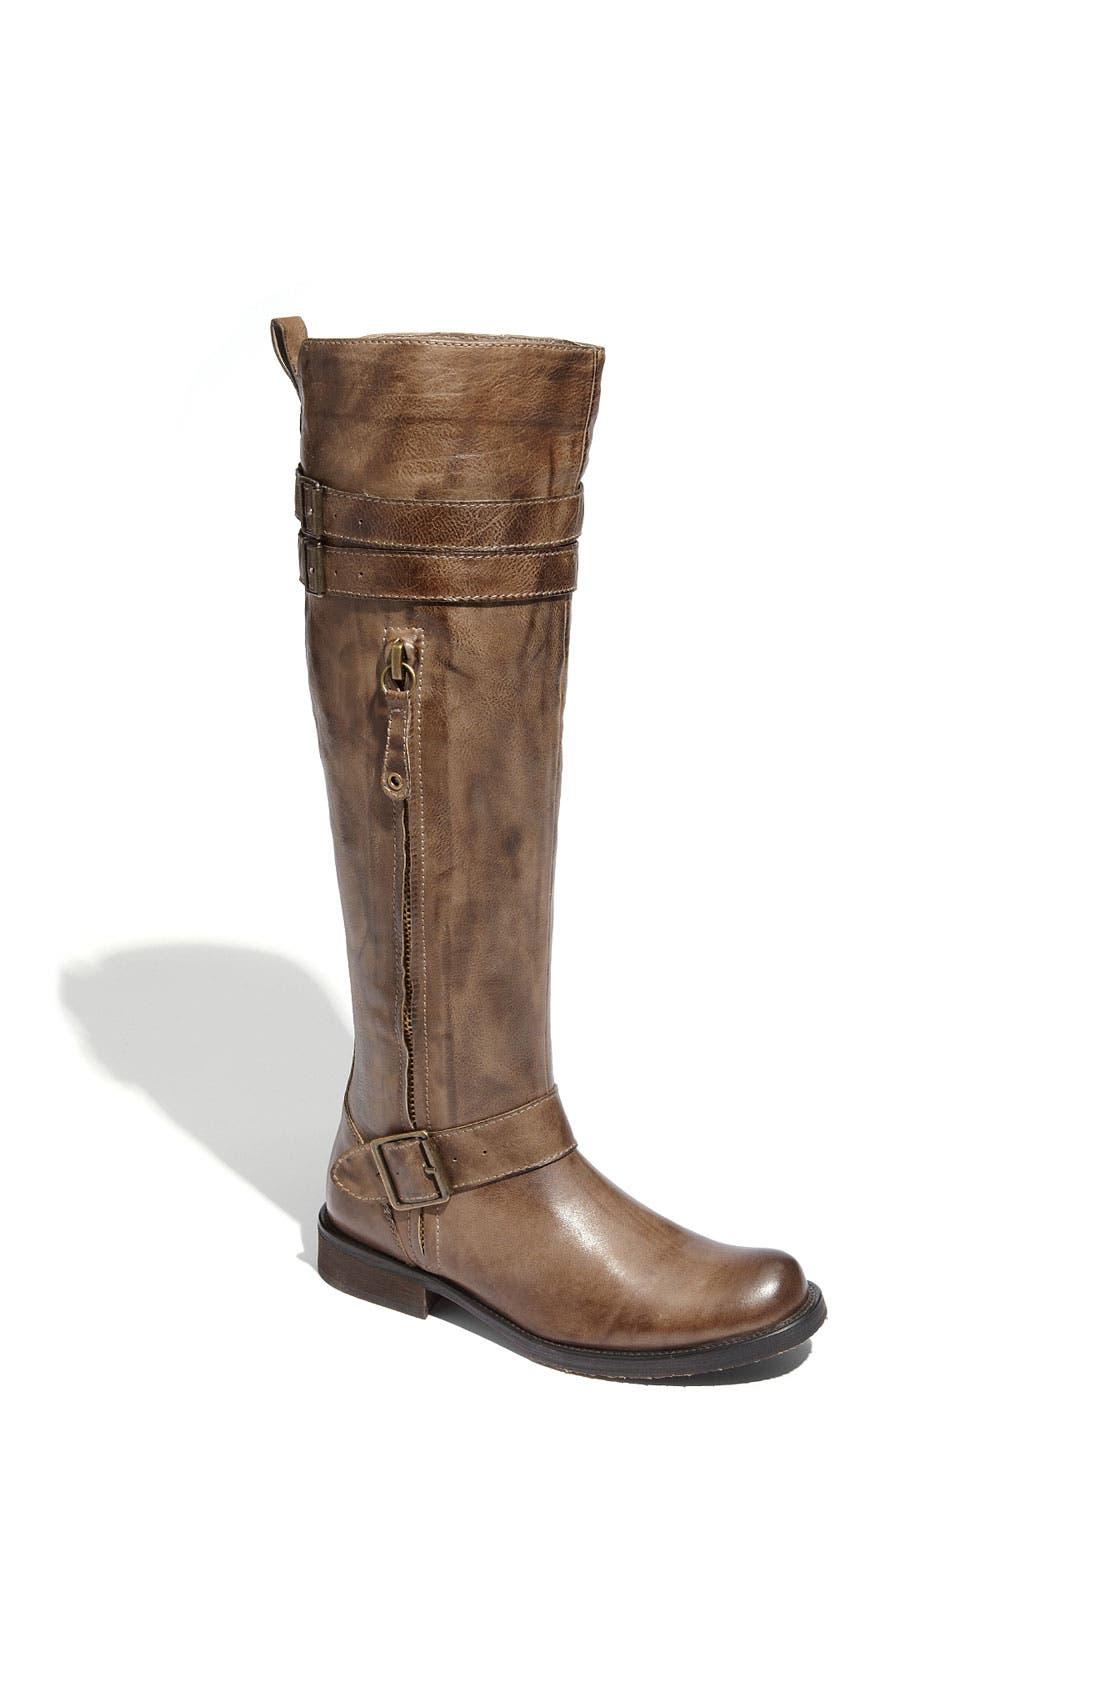 Main Image - Miz Mooz 'Kellen' Boot